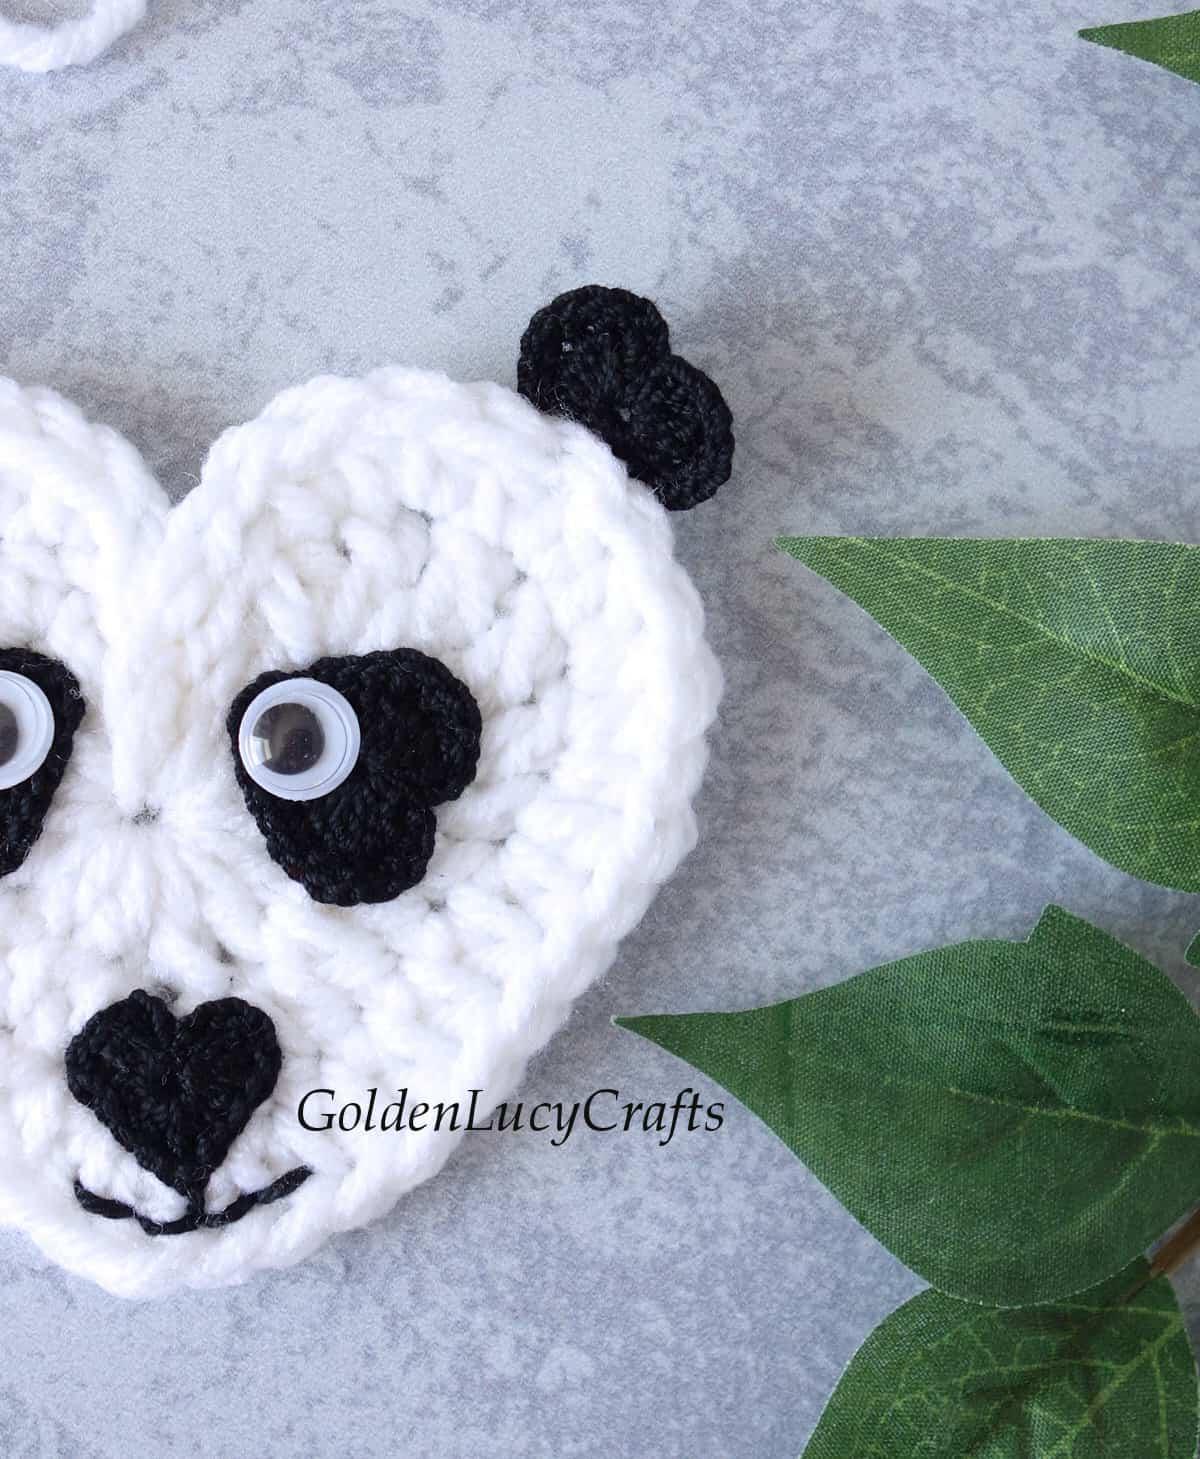 Half of crocheted panda face close up image.